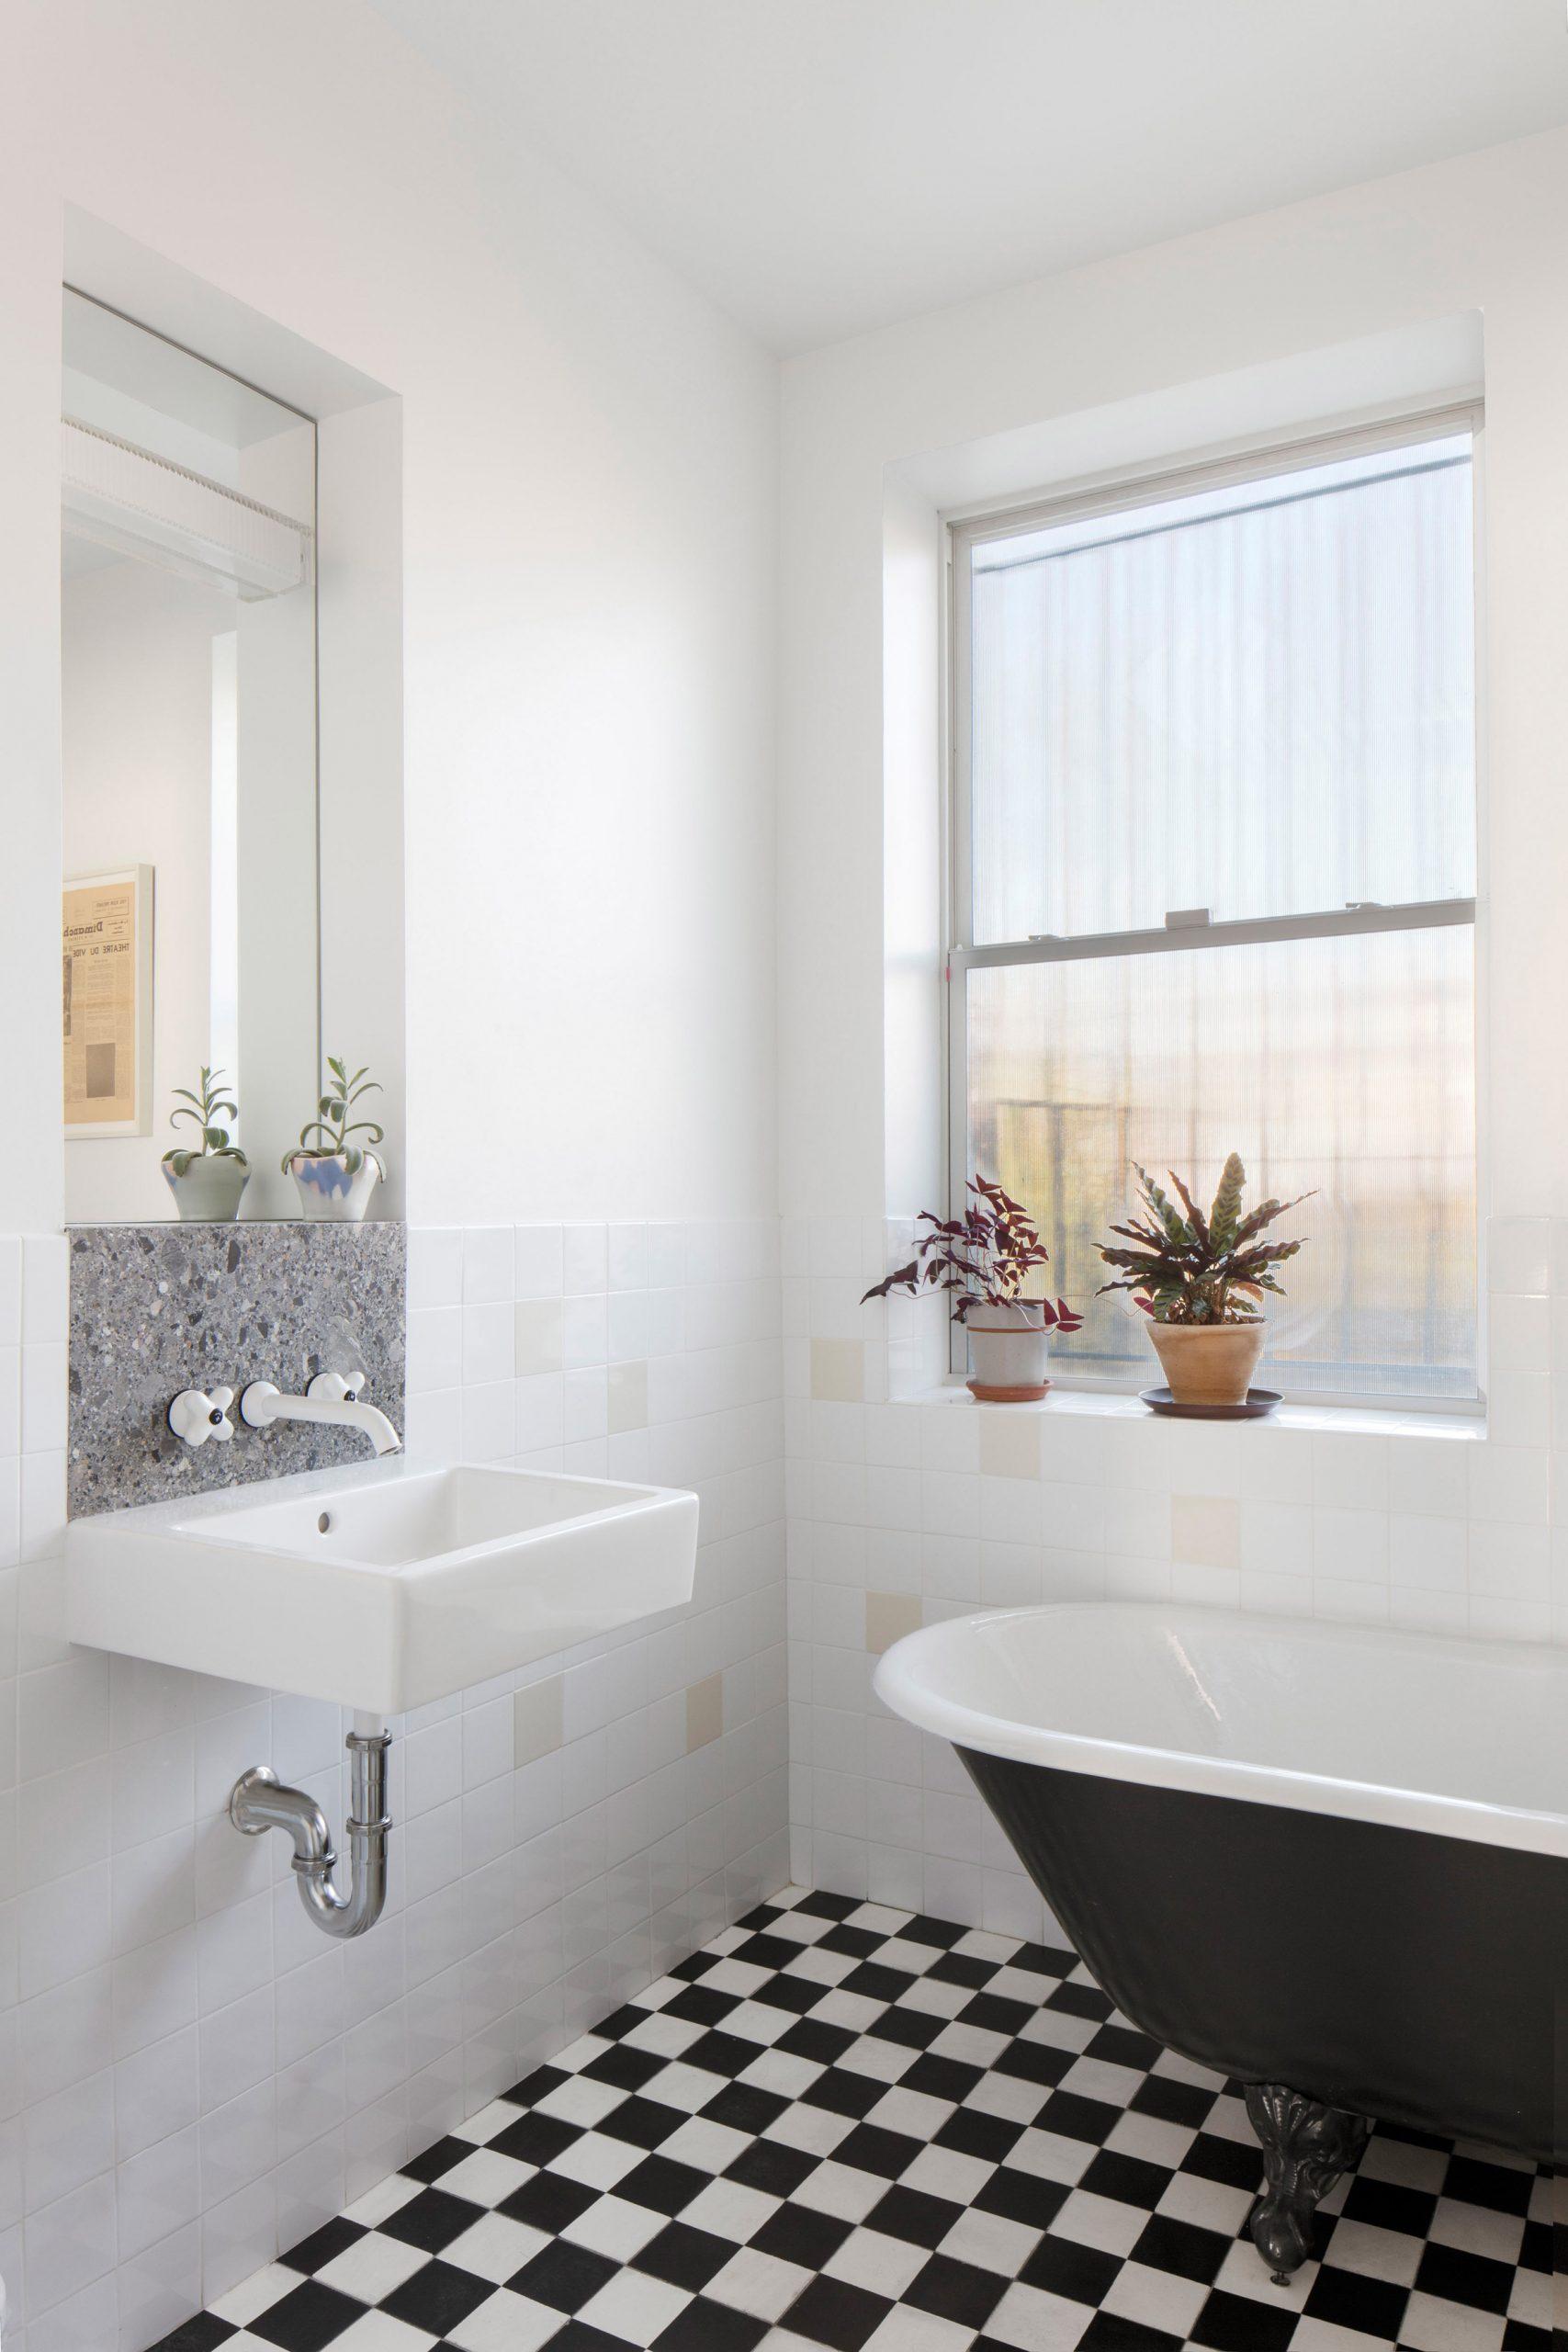 The bathroom has surplus cement tiles